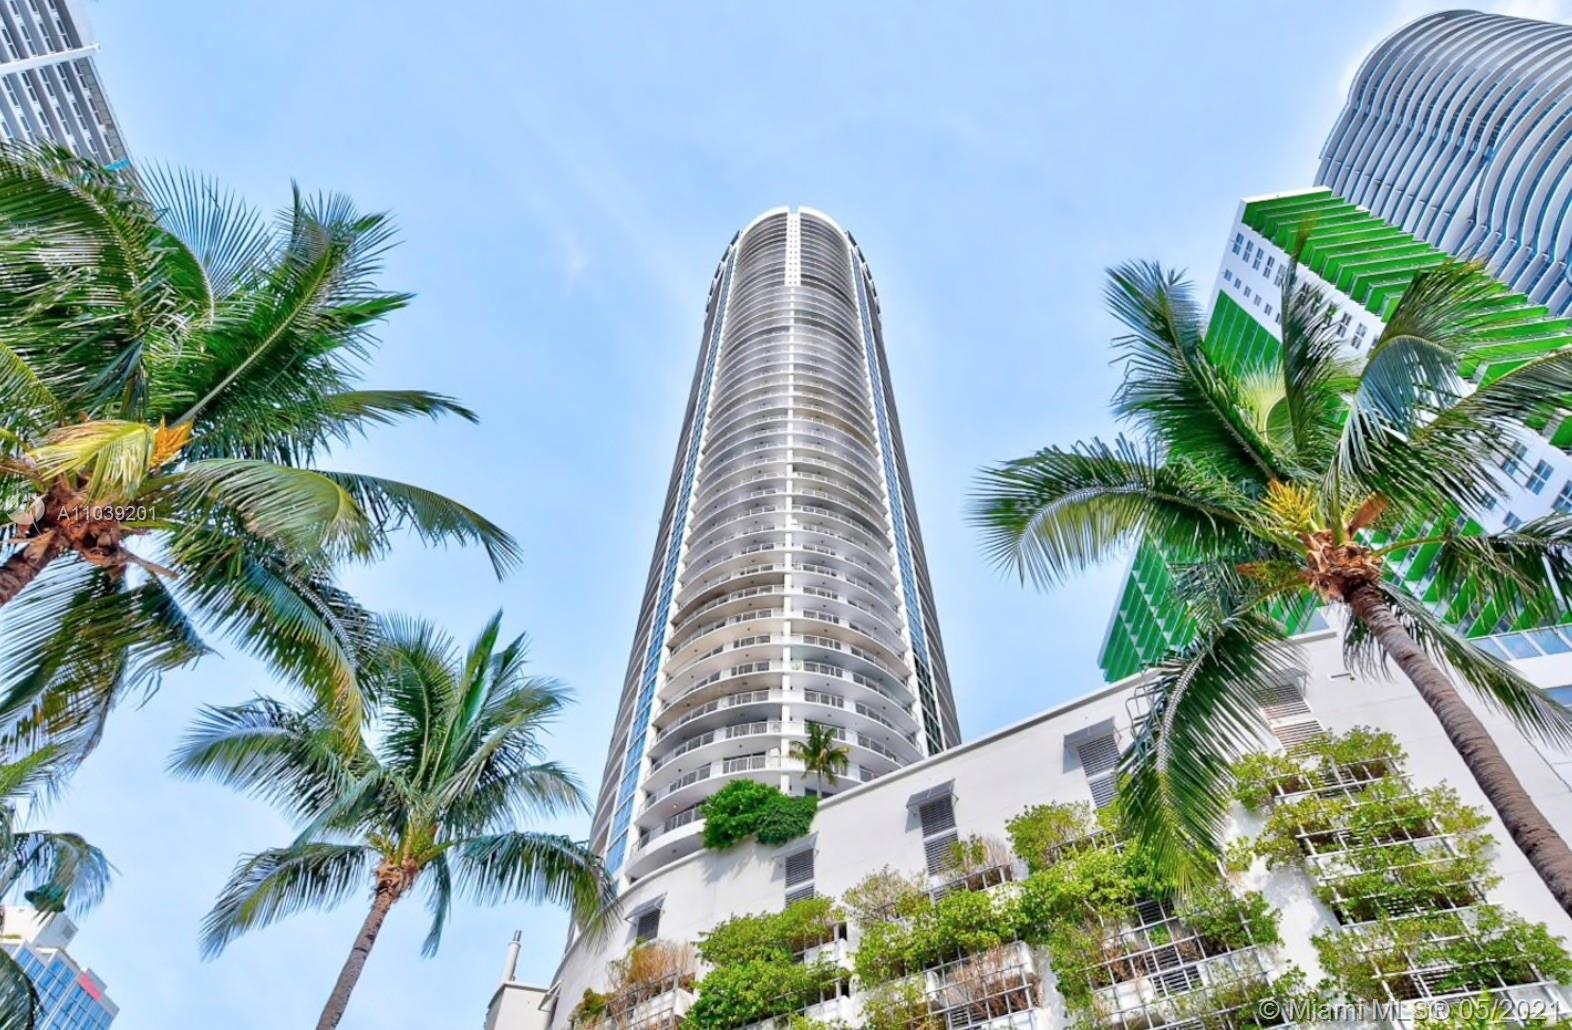 Opera Tower #4314 - 1750 N BAYSHORE DR #4314, Miami, FL 33132